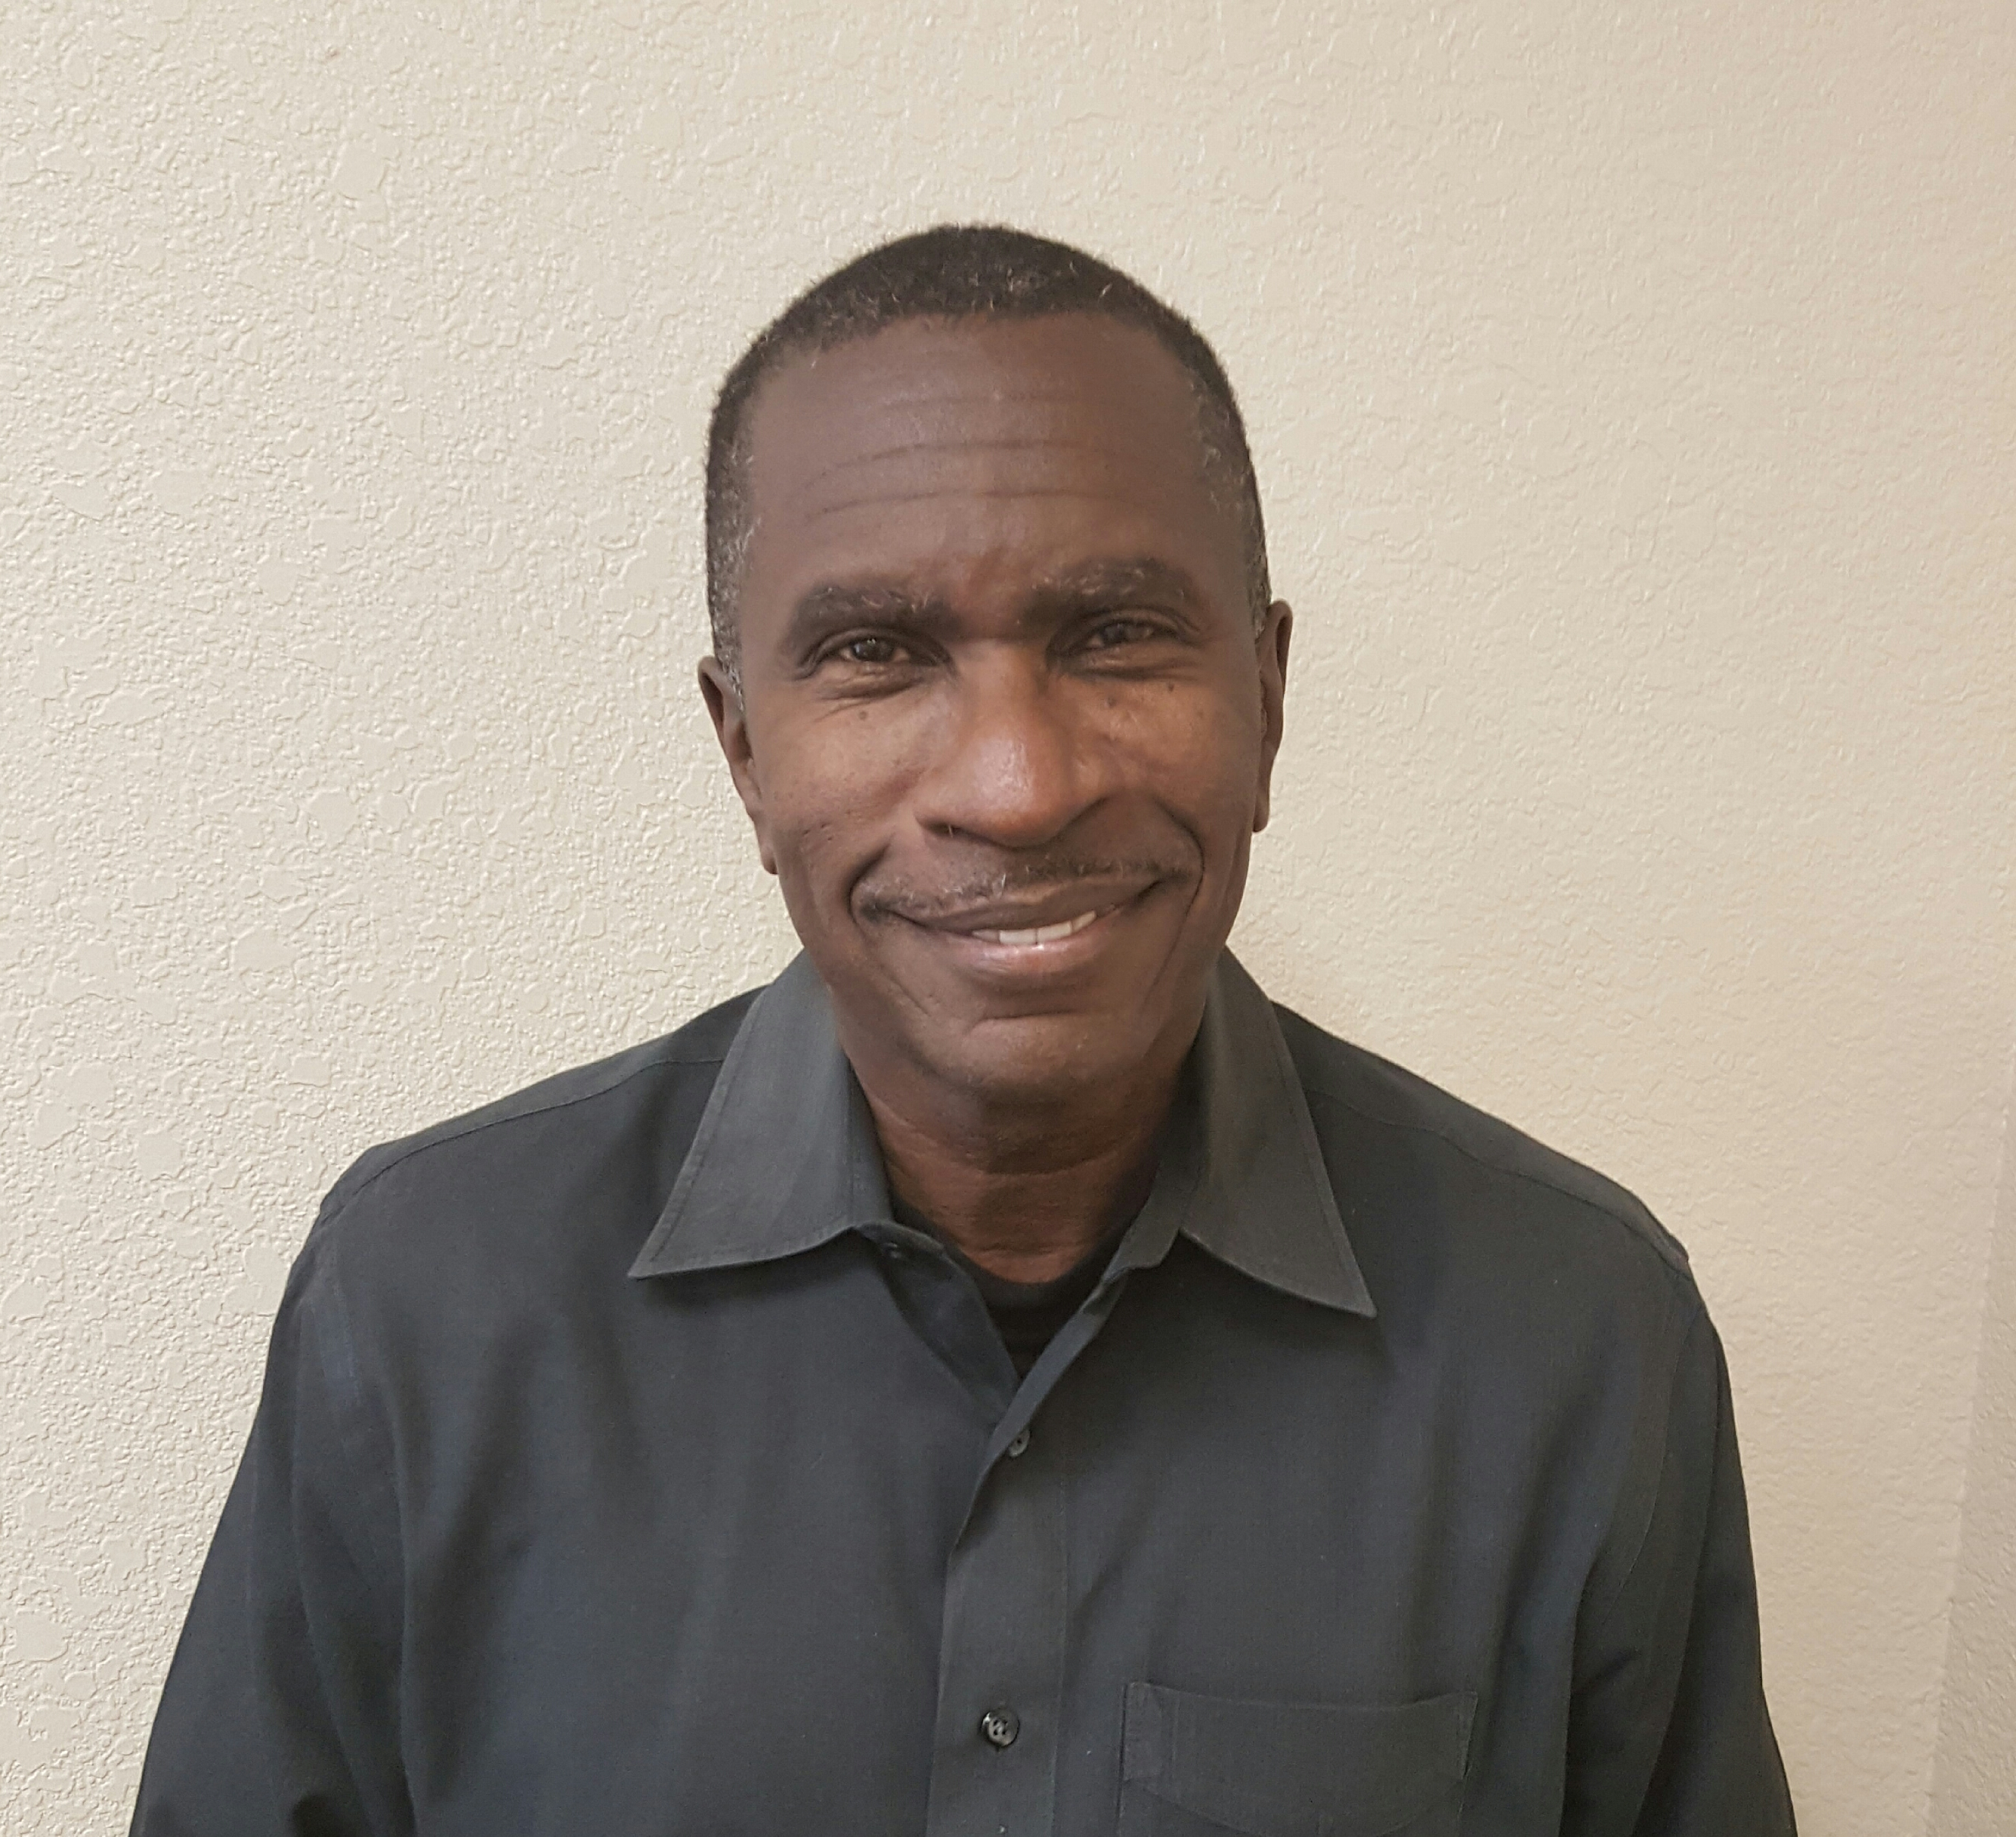 Pastor Ricky Wilson